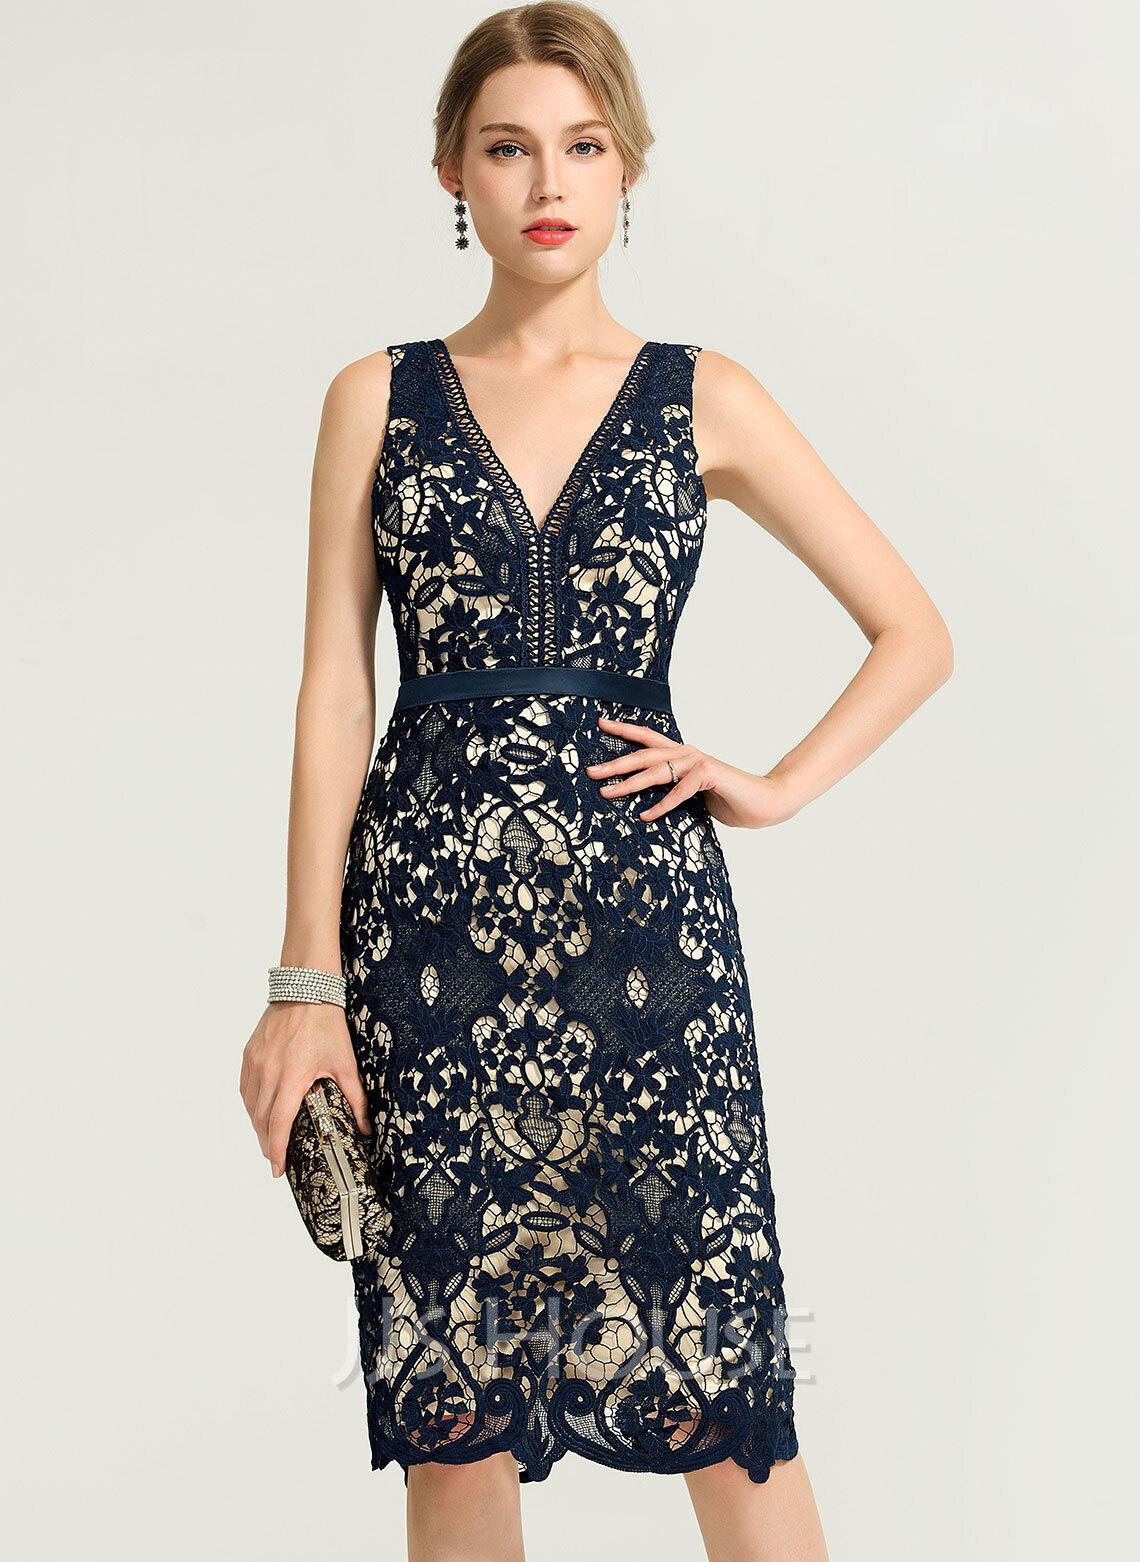 Sheath/Column V-neck Knee-Length Lace Cocktail Dress